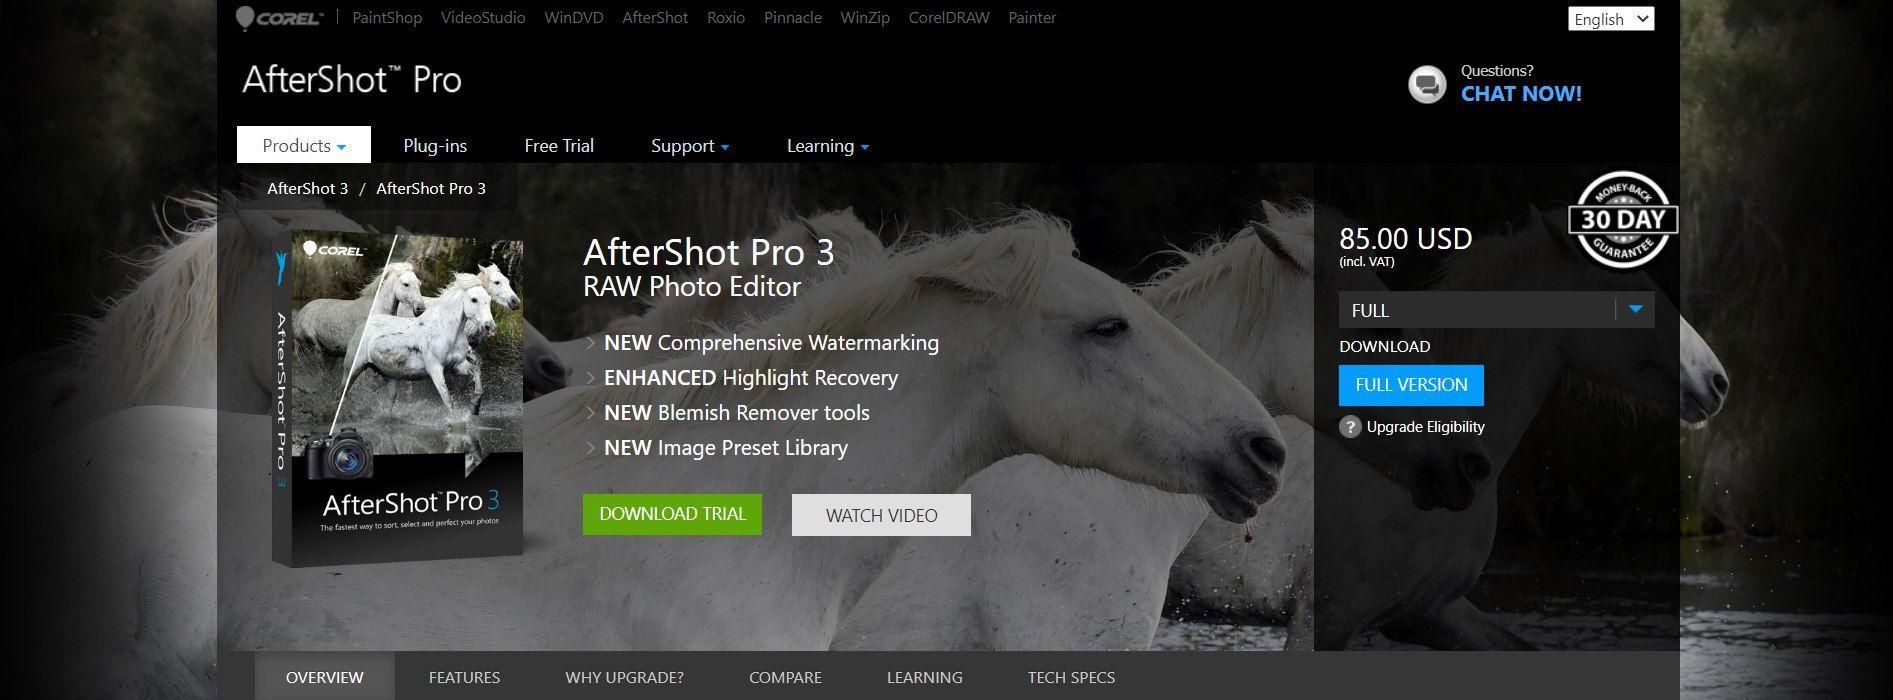 Corel AfterShot 3 interface